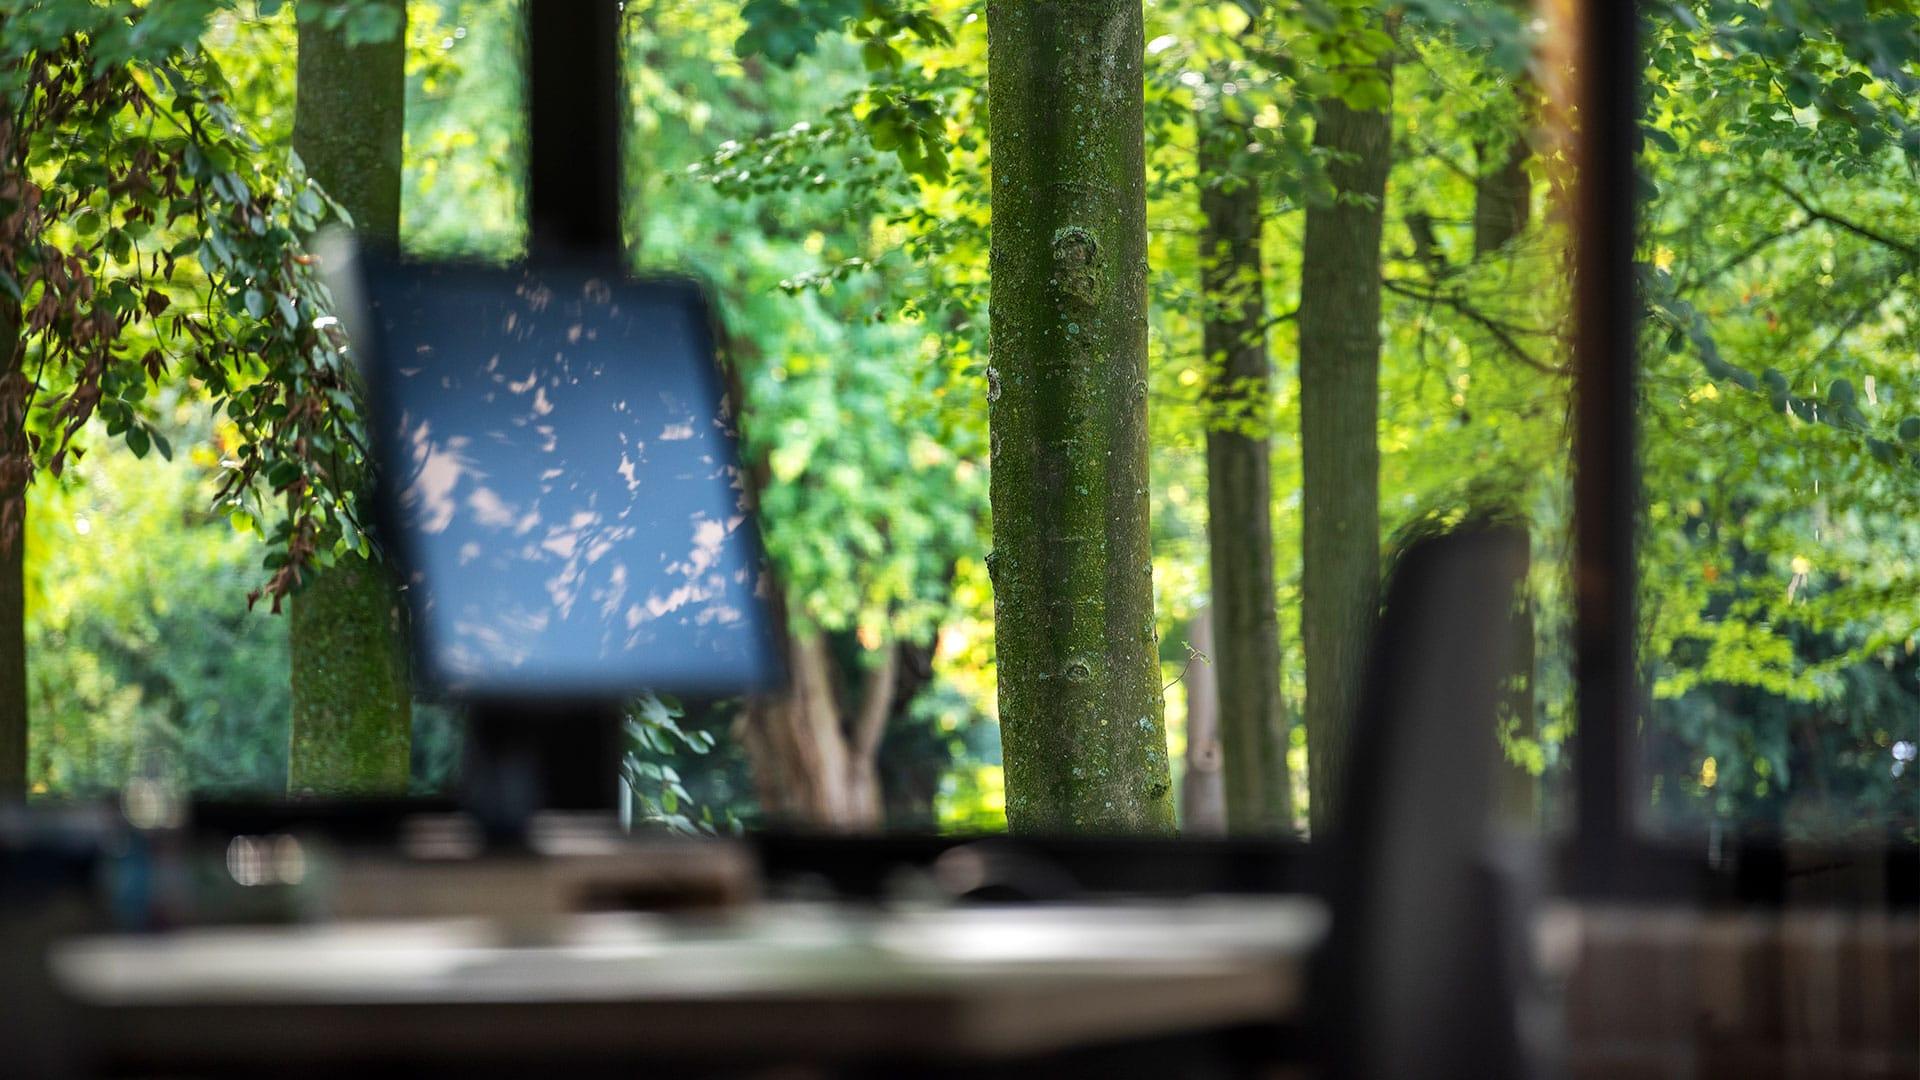 Arnhems-Buiten_B09_Weusten-Liedenbaum-Architecten_groene-omgeving